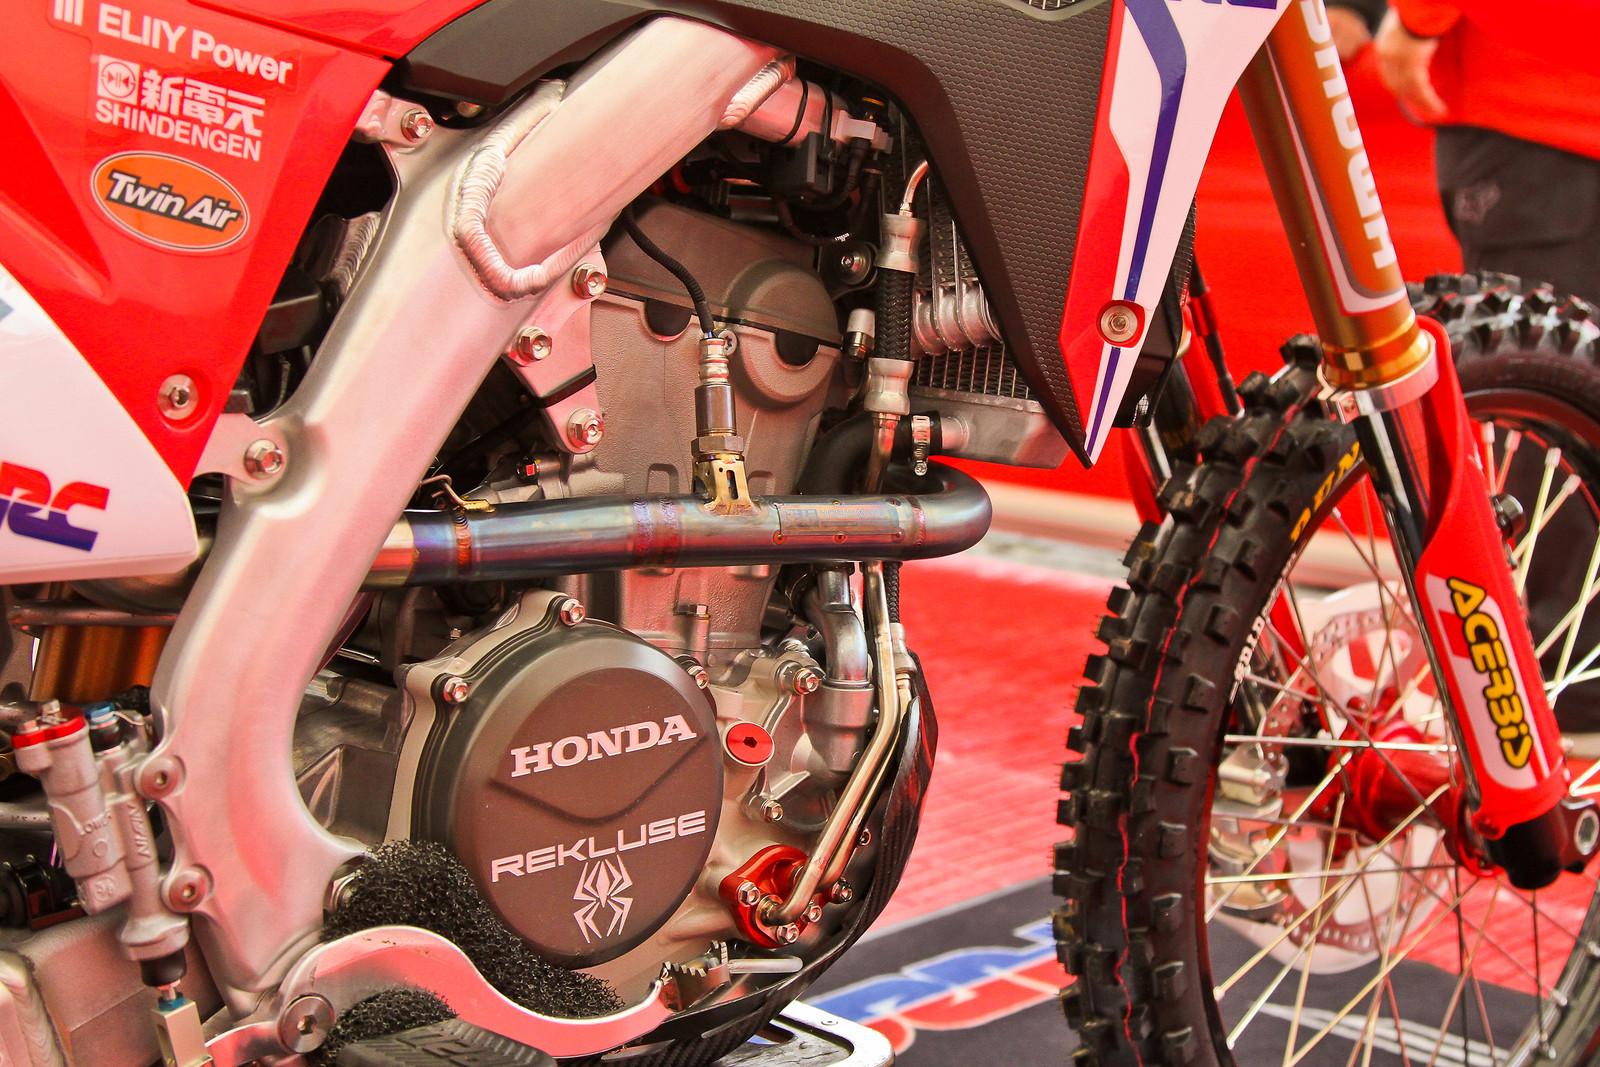 2018 Honda CRF250RW - Engine Right Side - ayearinmx - Motocross Pictures - Vital MX